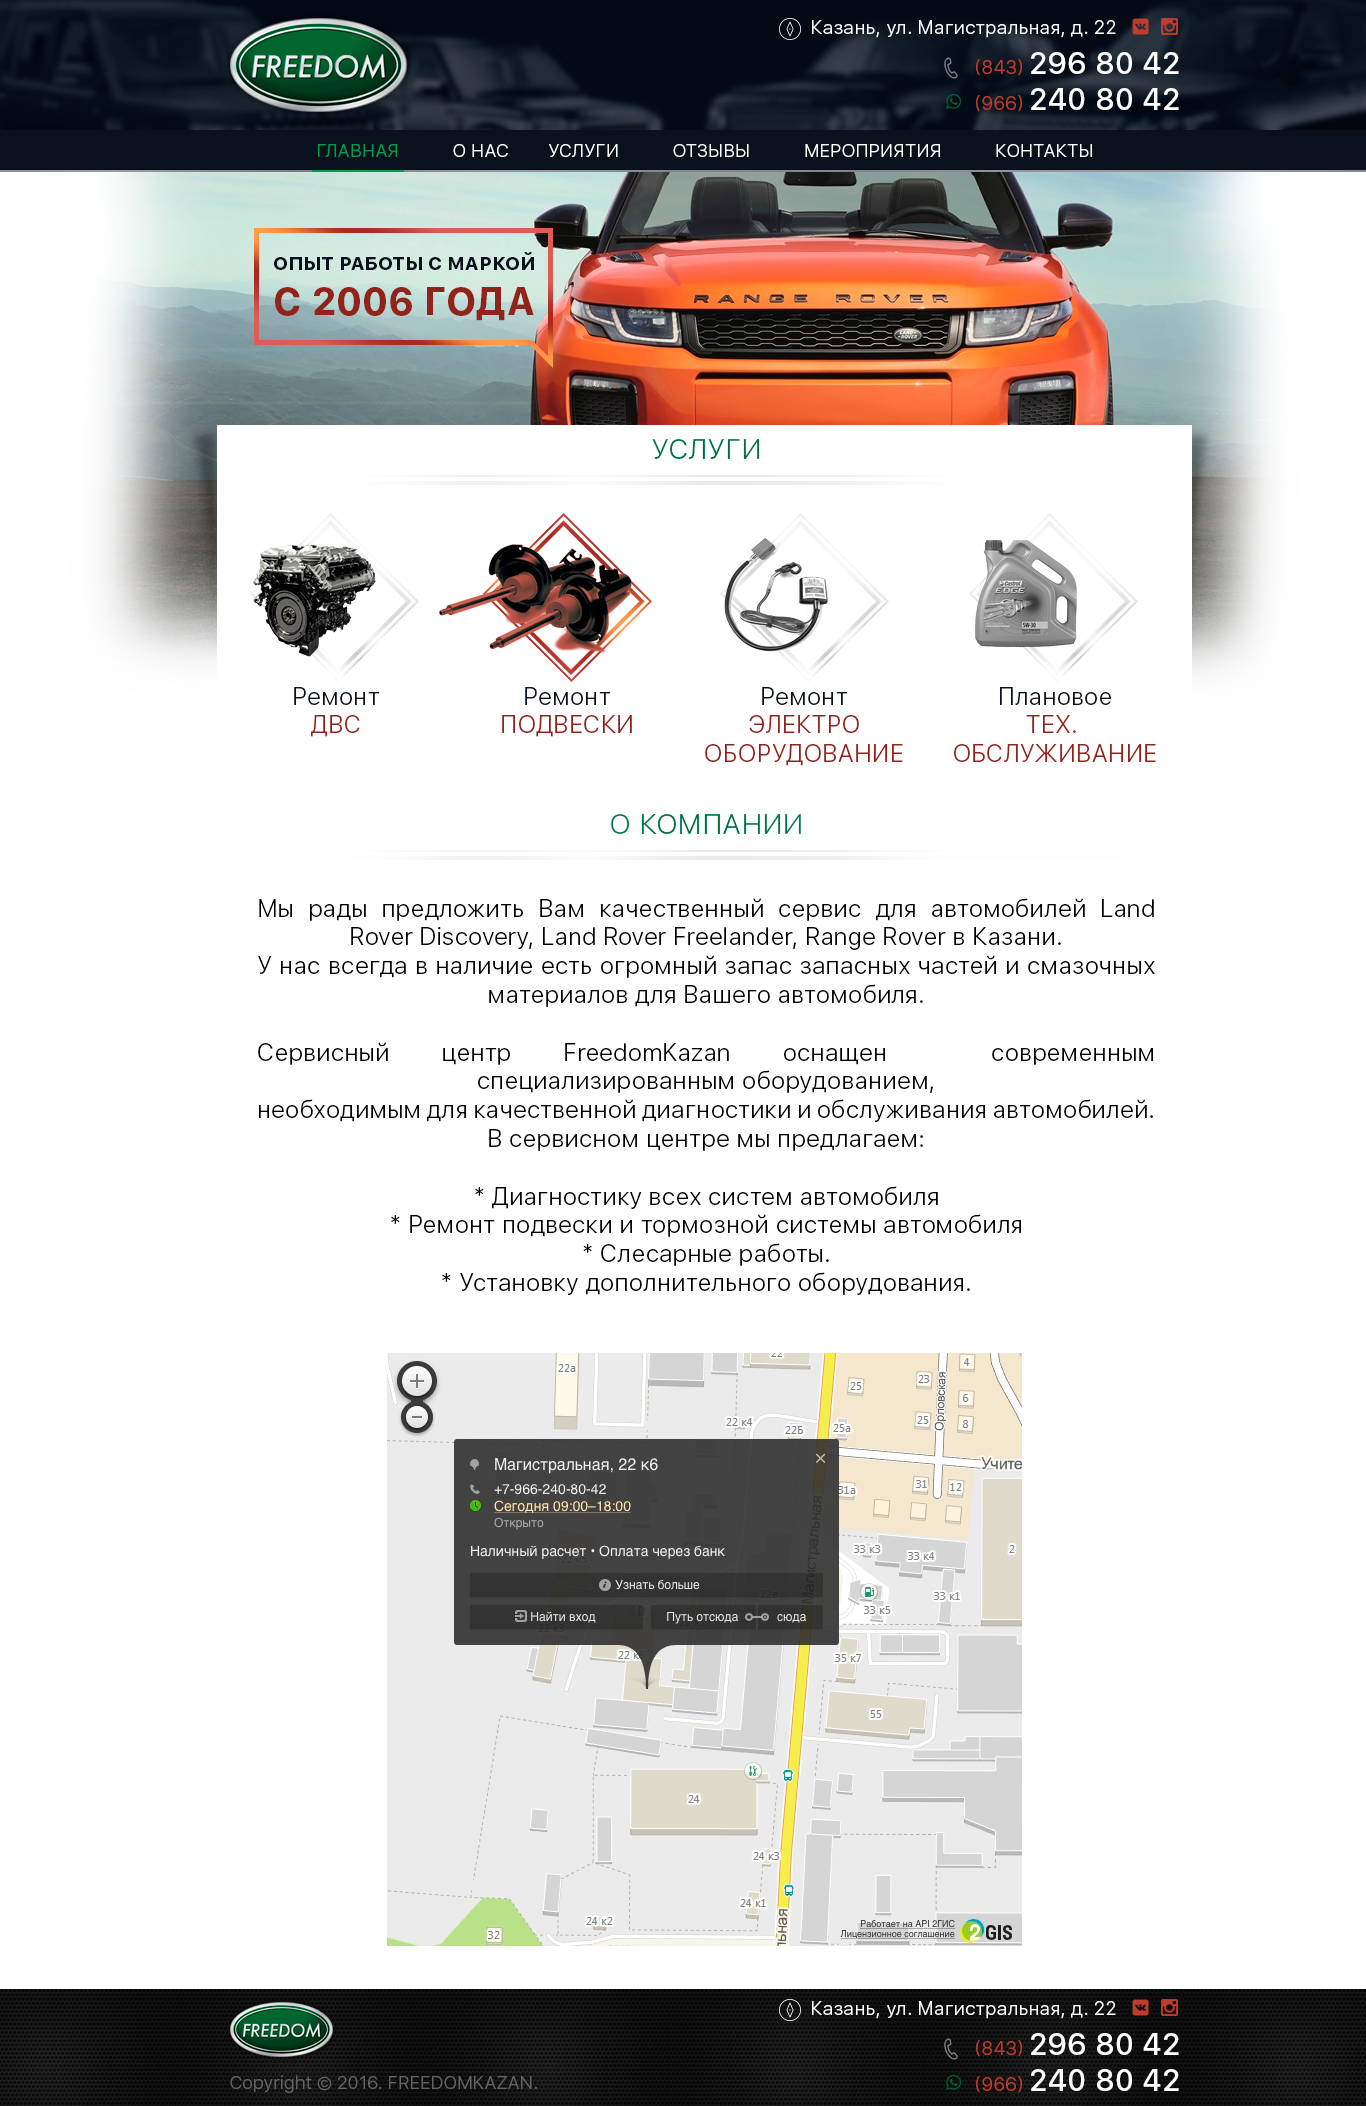 FREEDOMKAZAN сервис по ремонту и обслуживанию автомобилей Land Rover